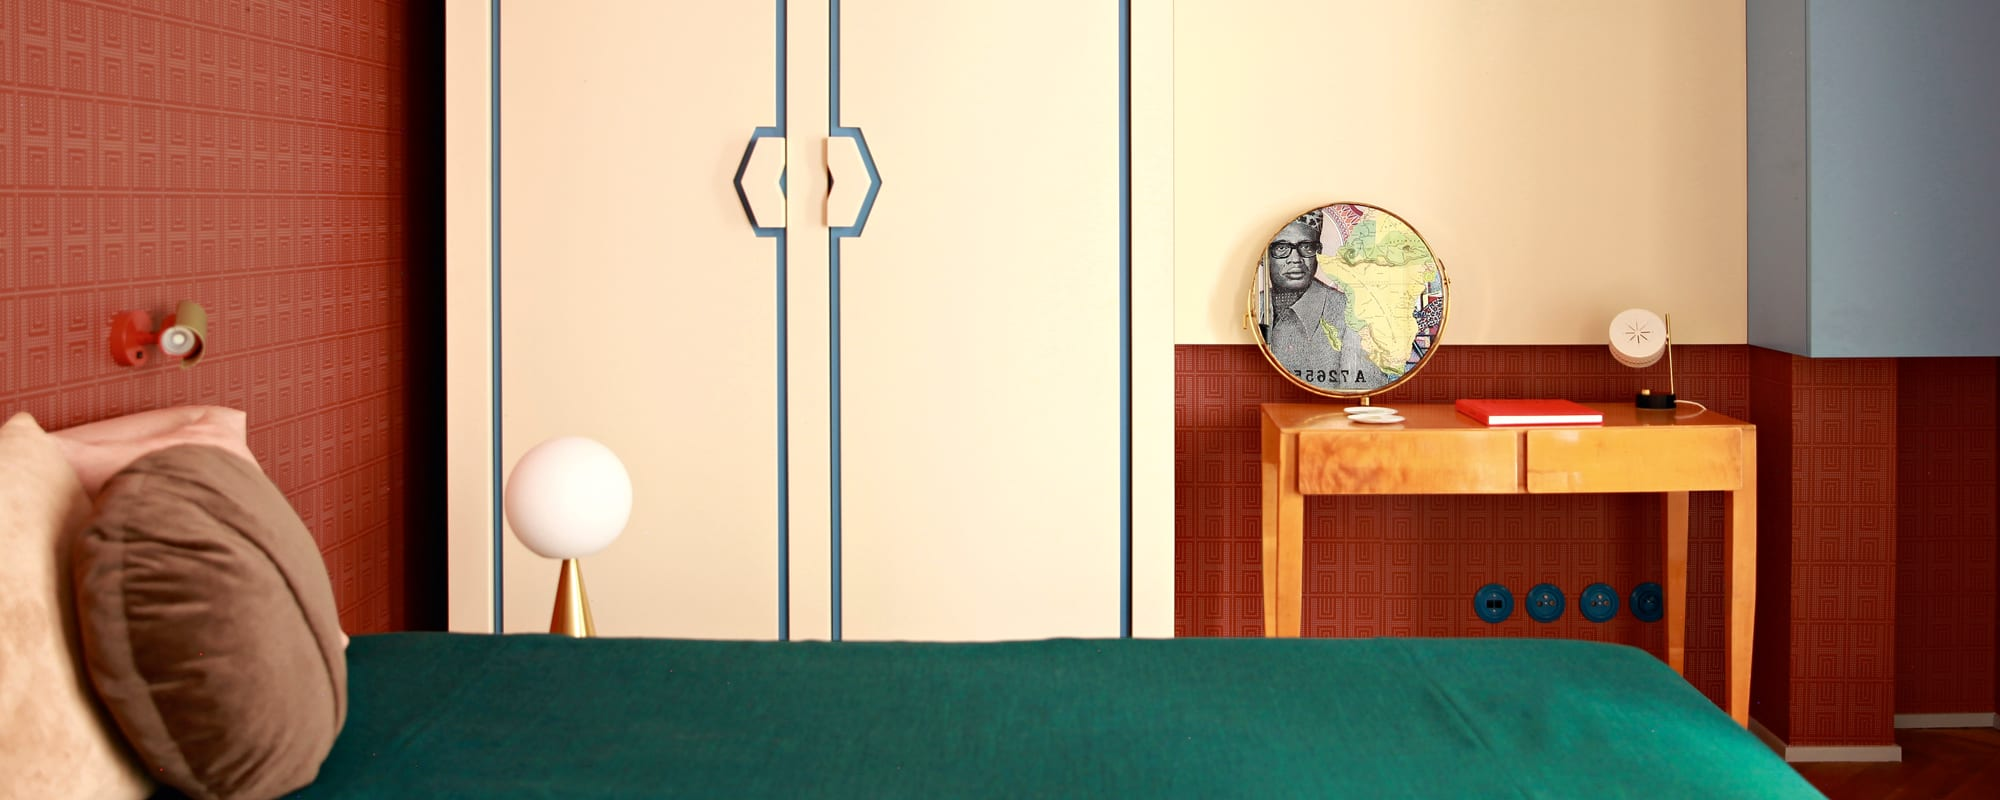 Marcante-Testa, Interiordesign, Carola Ripamonti, AD